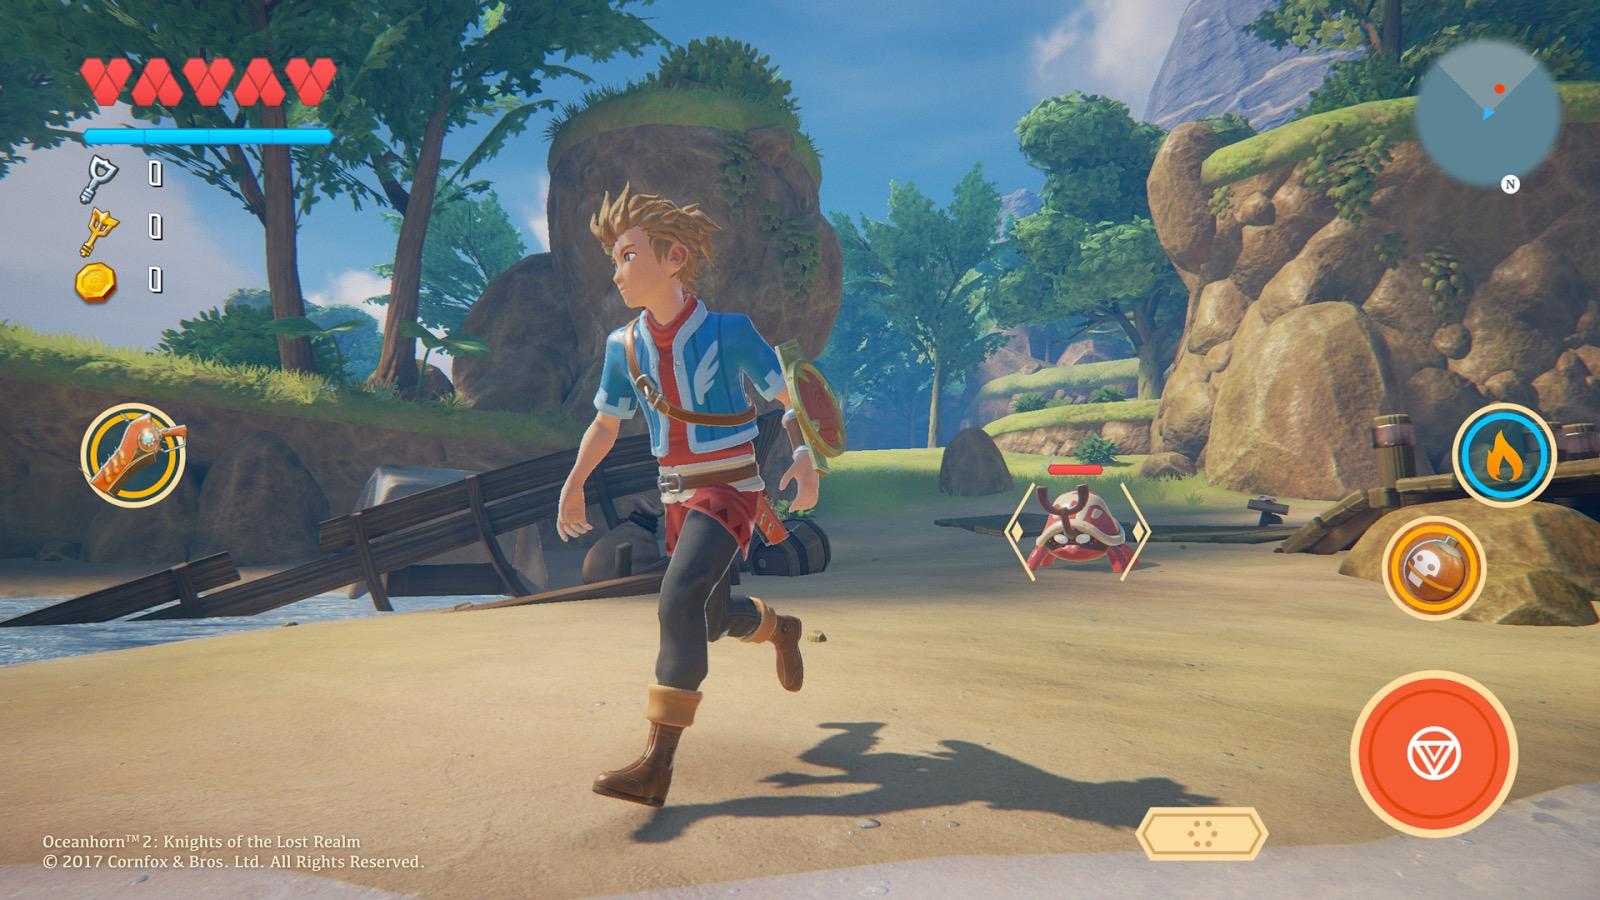 Oceanhorn 2 sarà basato su Unreal Engine 4: ecco nuove schermate -  Macitynet.it